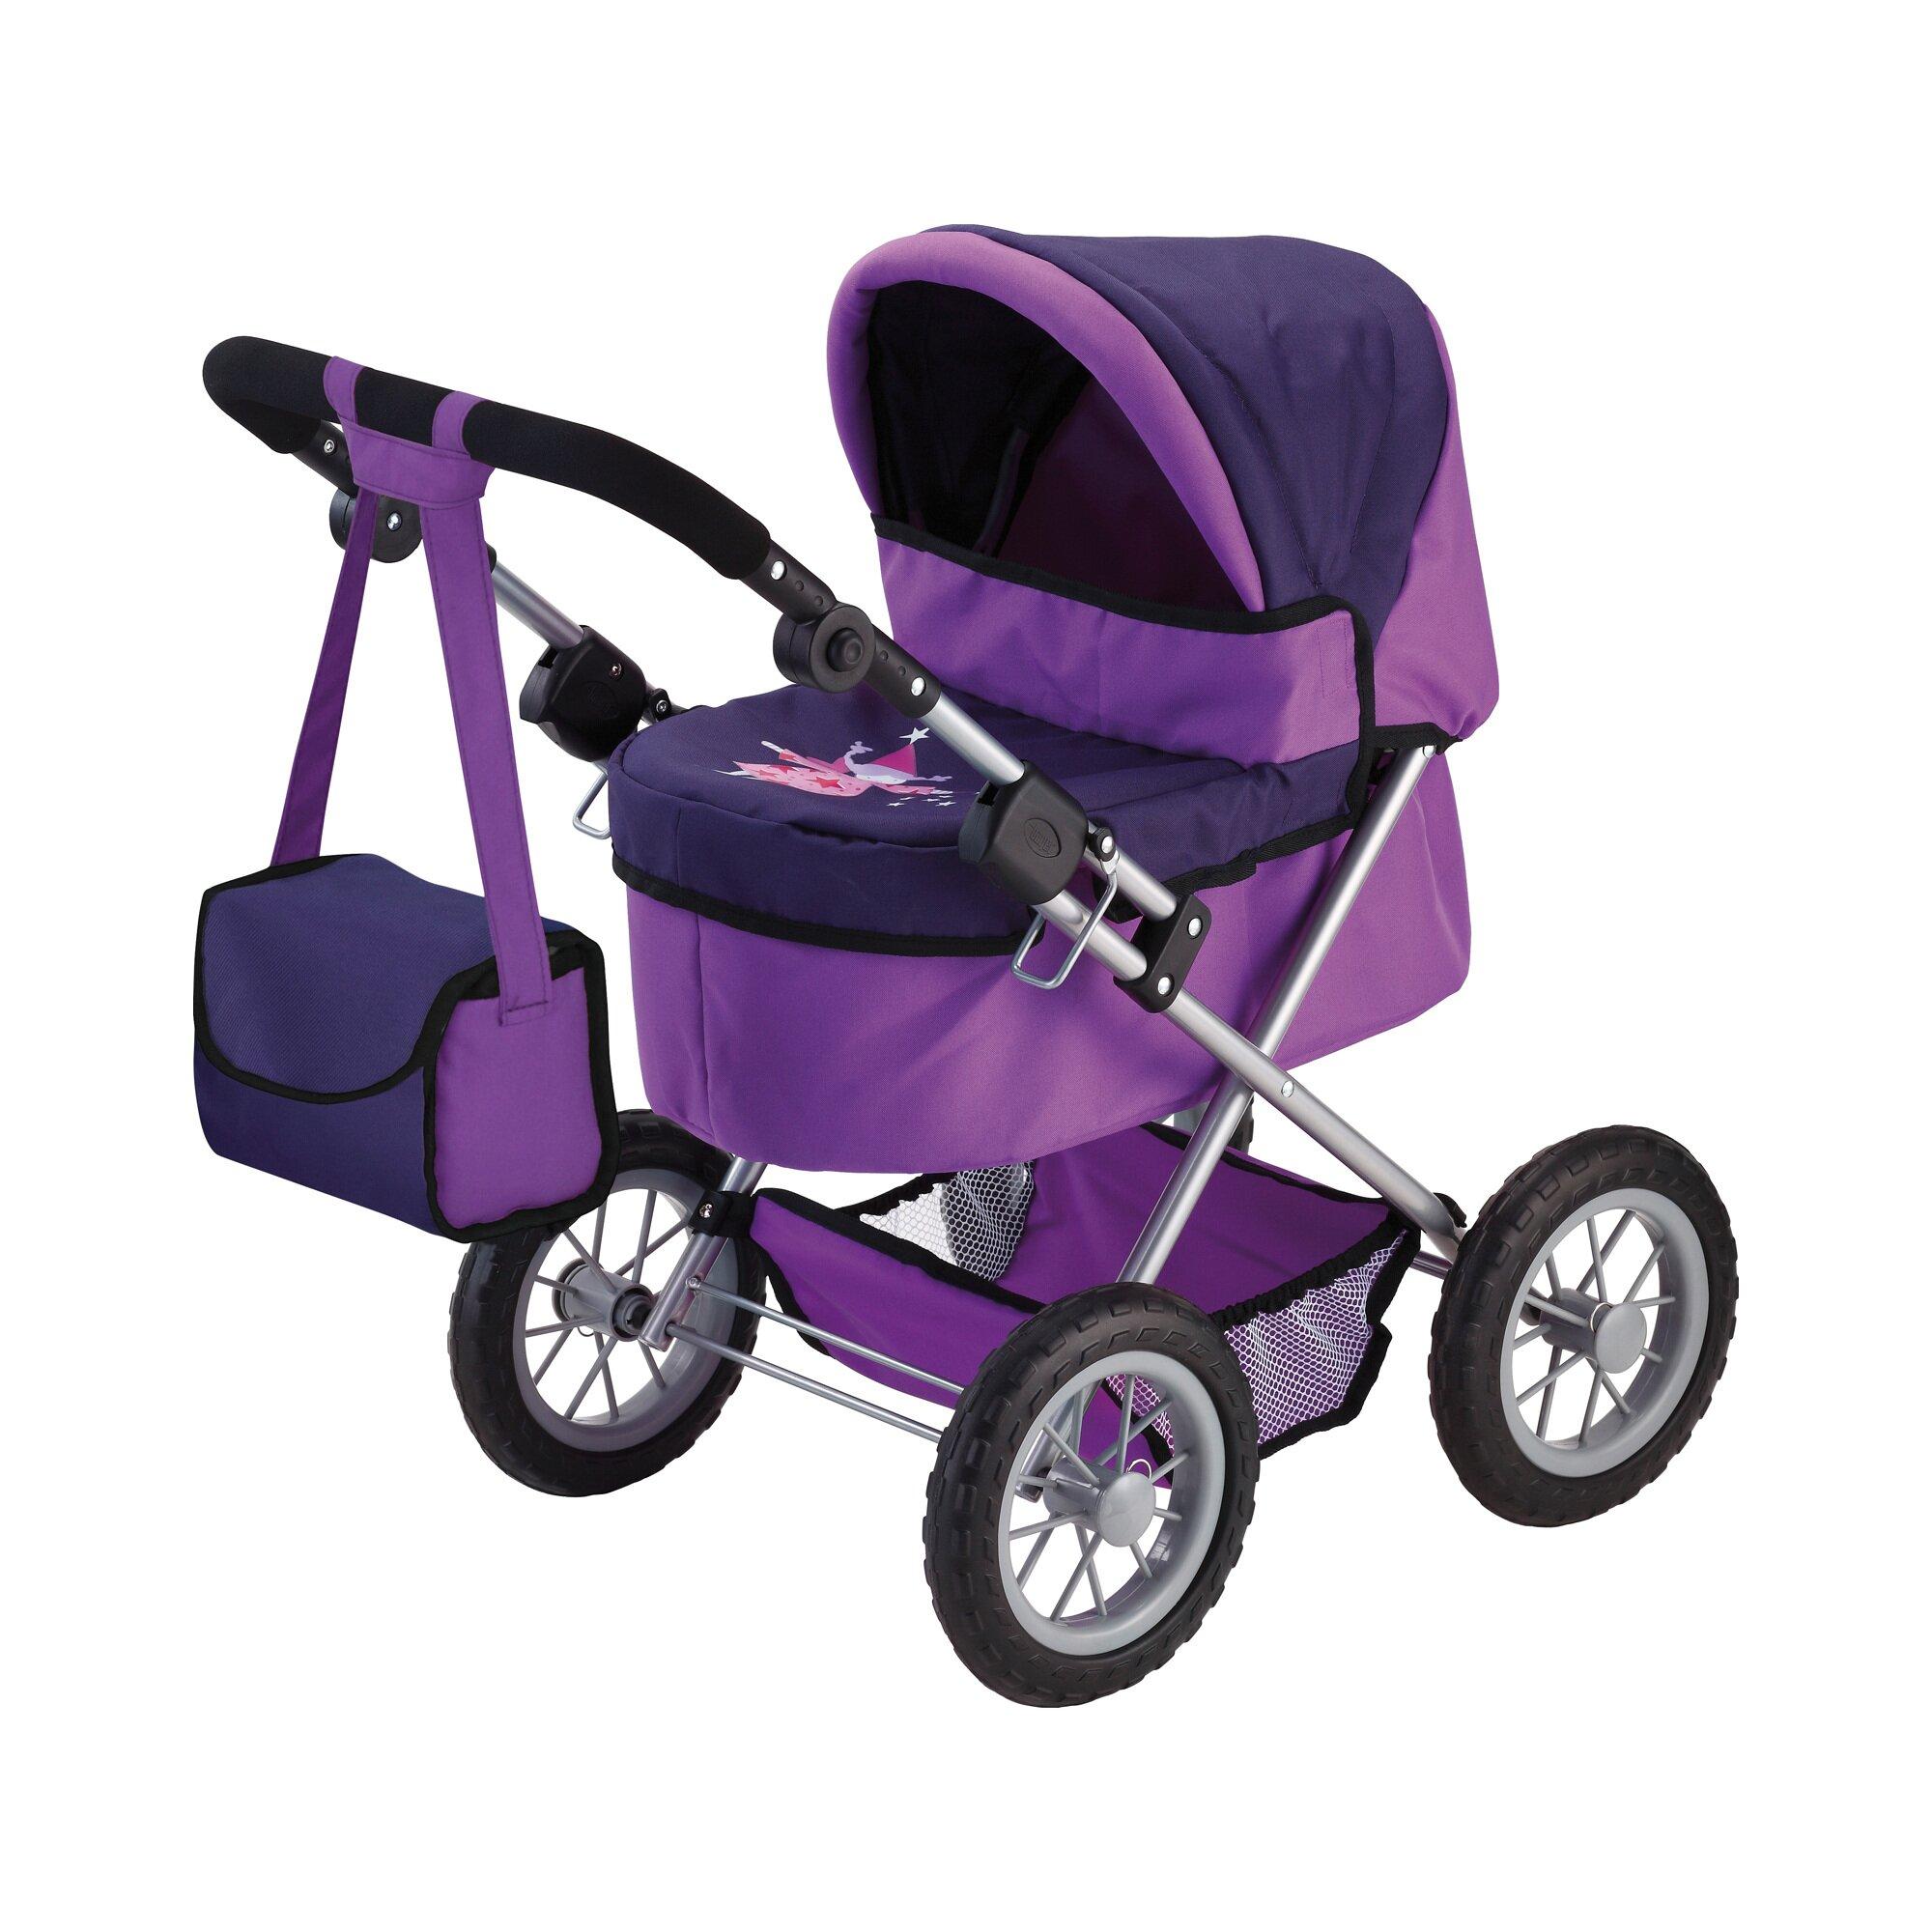 Bayer Design Puppenwagen Trendy